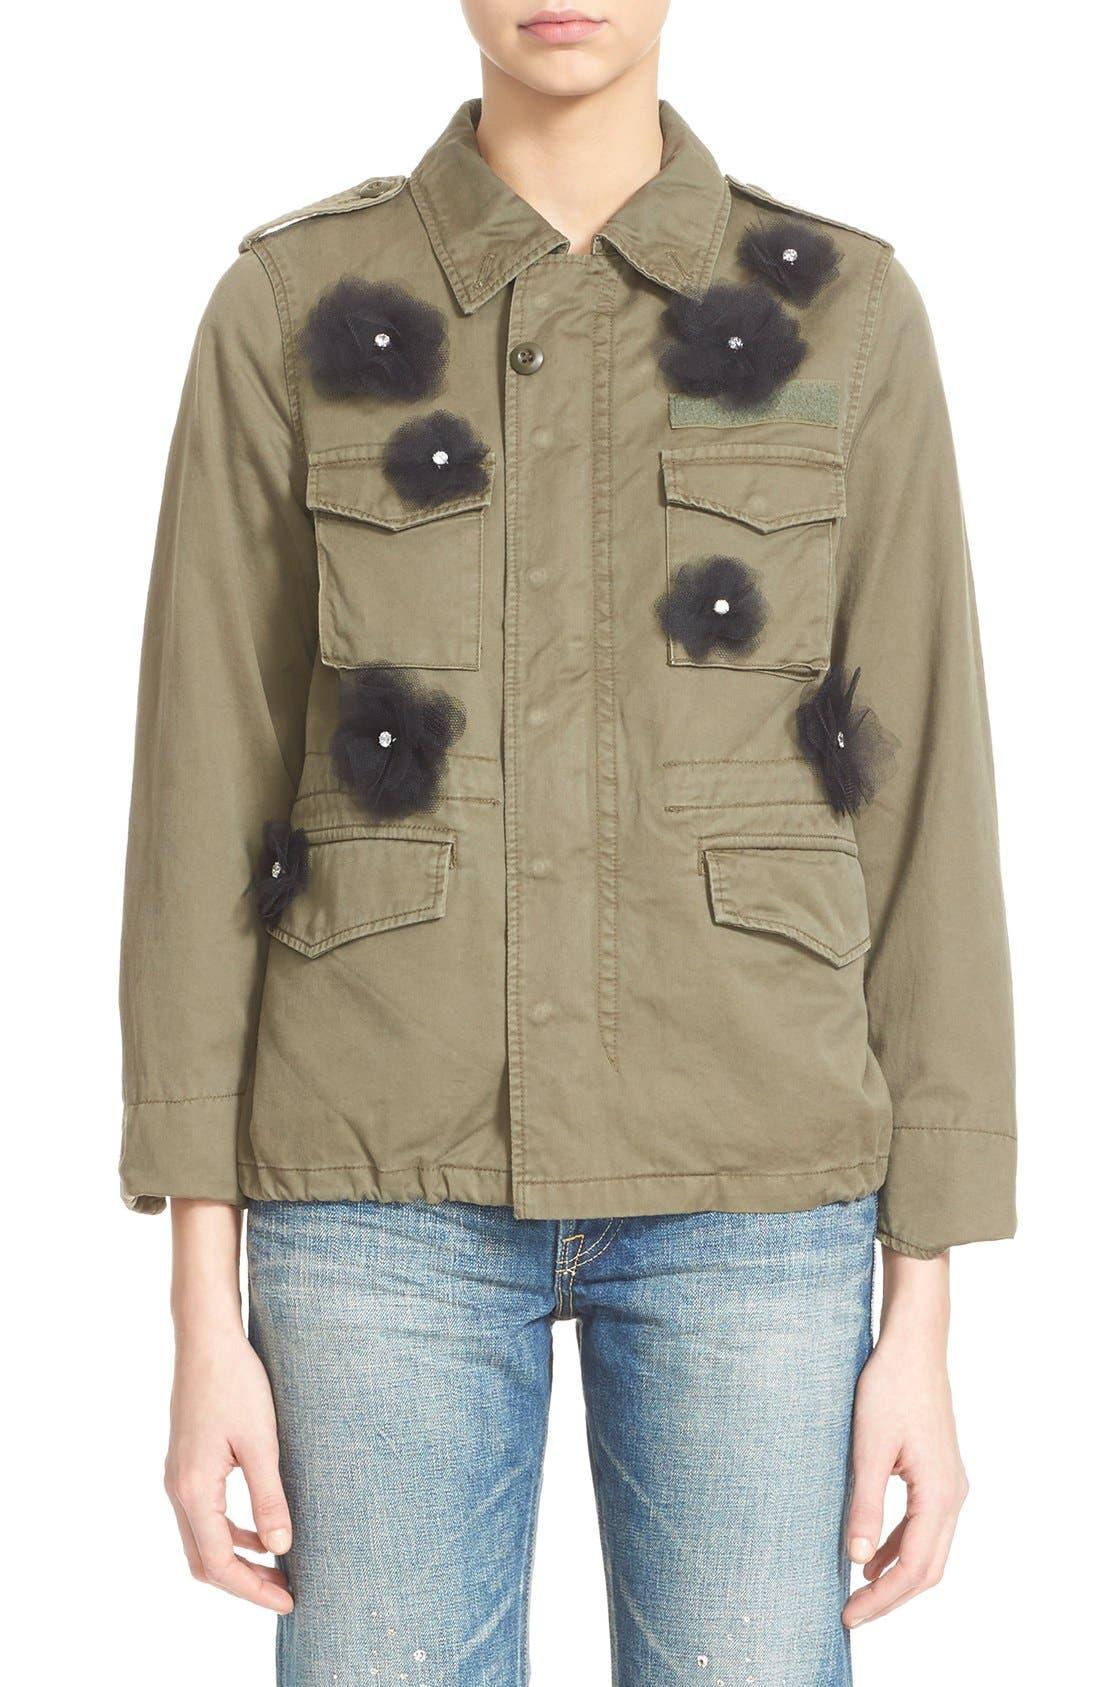 Alternate Image 1 Selected - Tu es mon TRÉSOR Tulle Flower Military Jacket